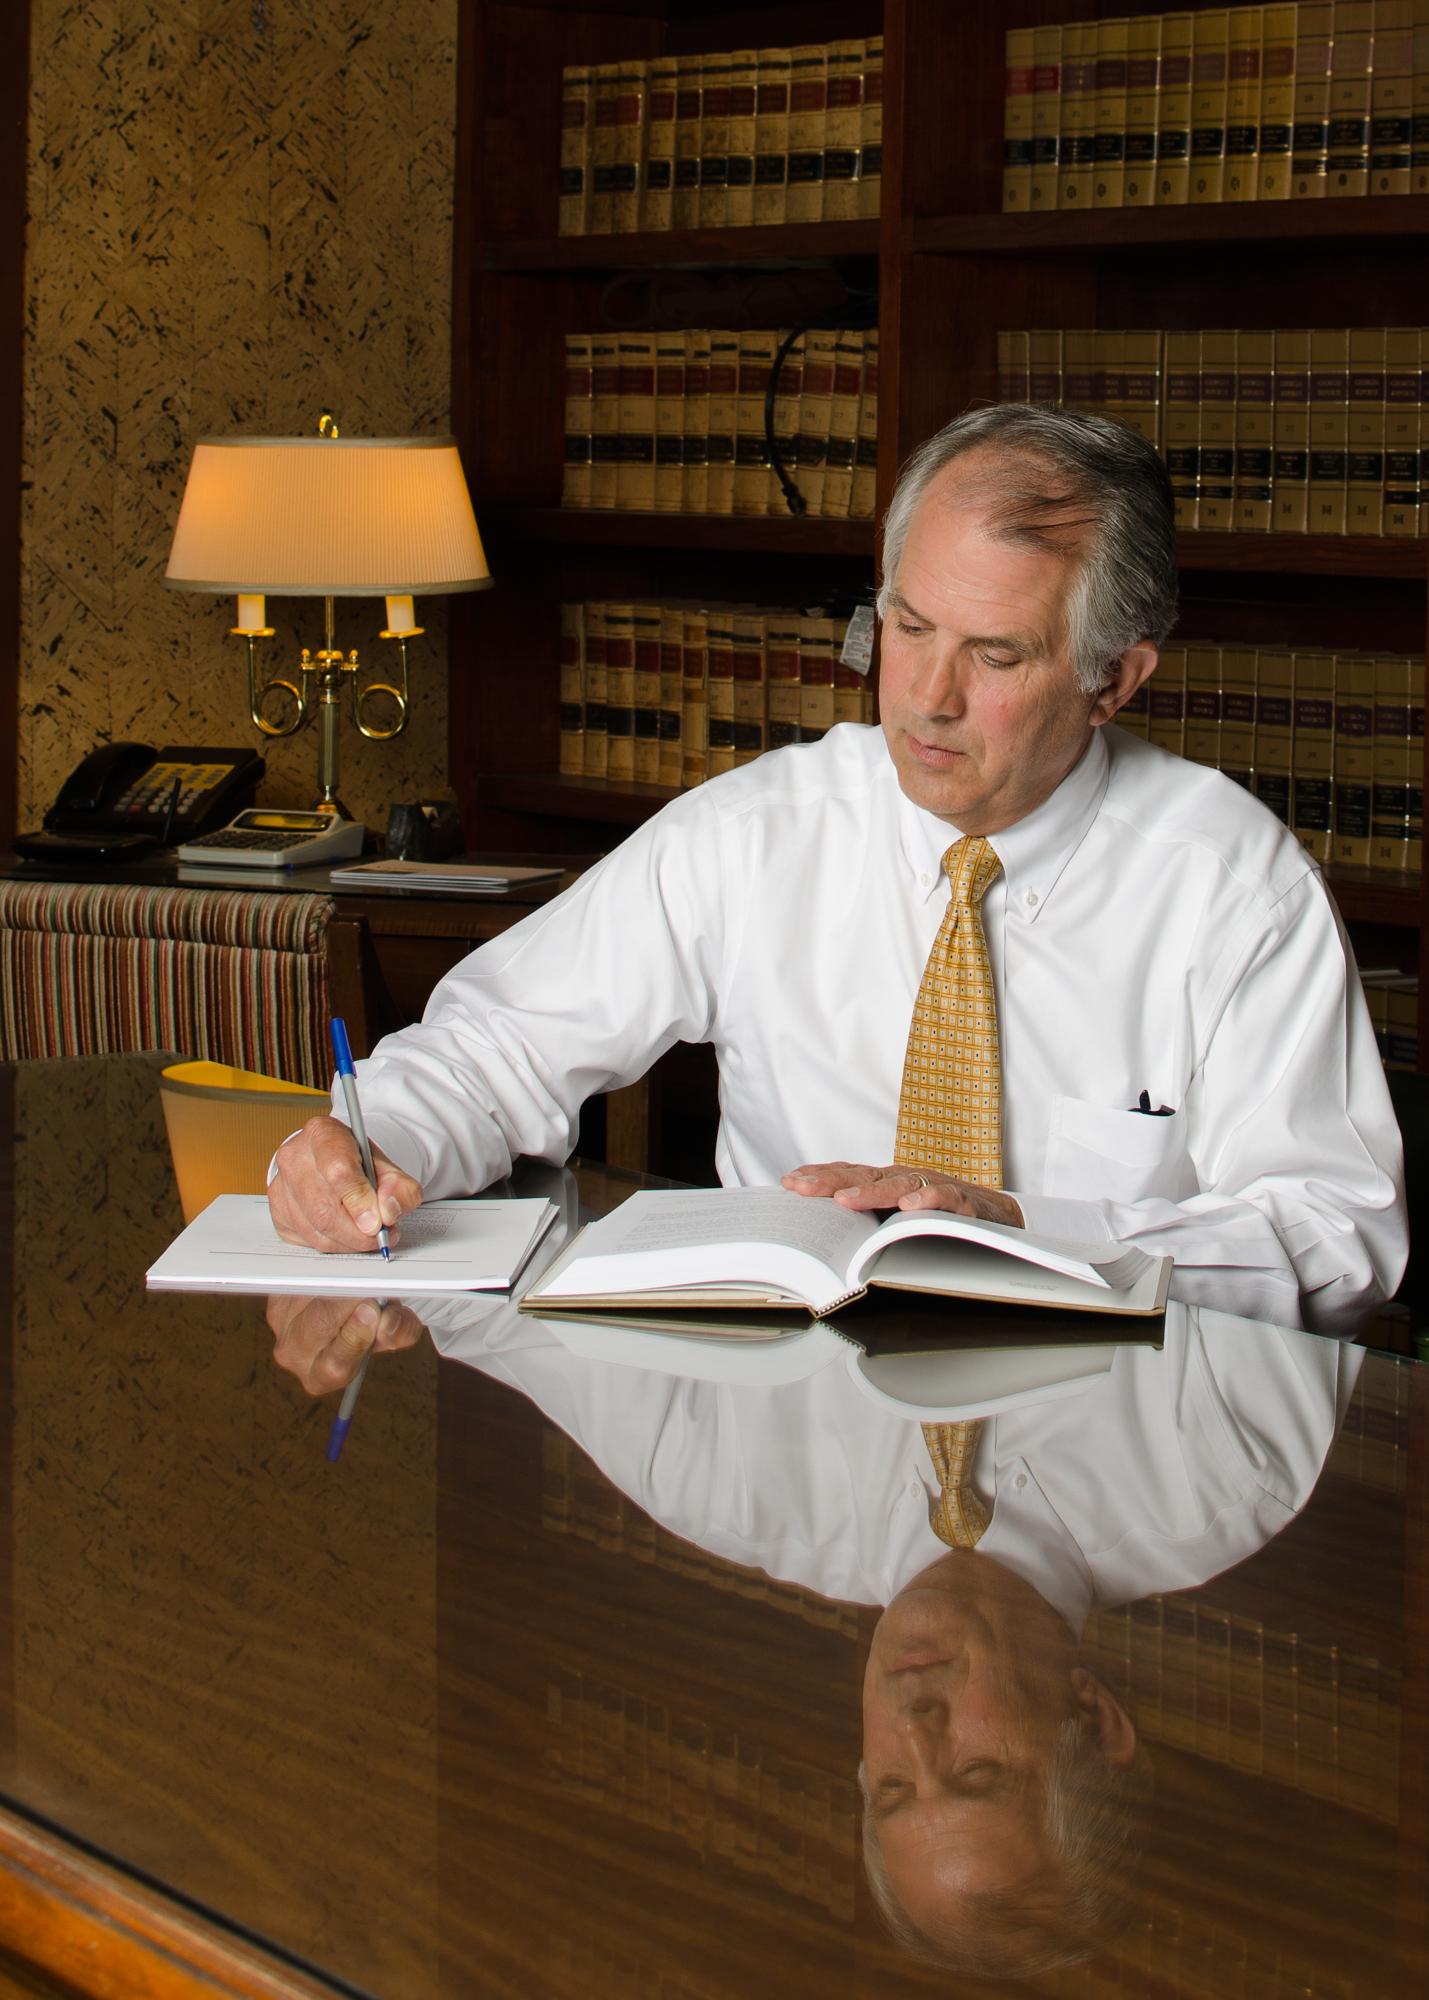 Bruce W. Kirbo, Jr. Attorney at Law